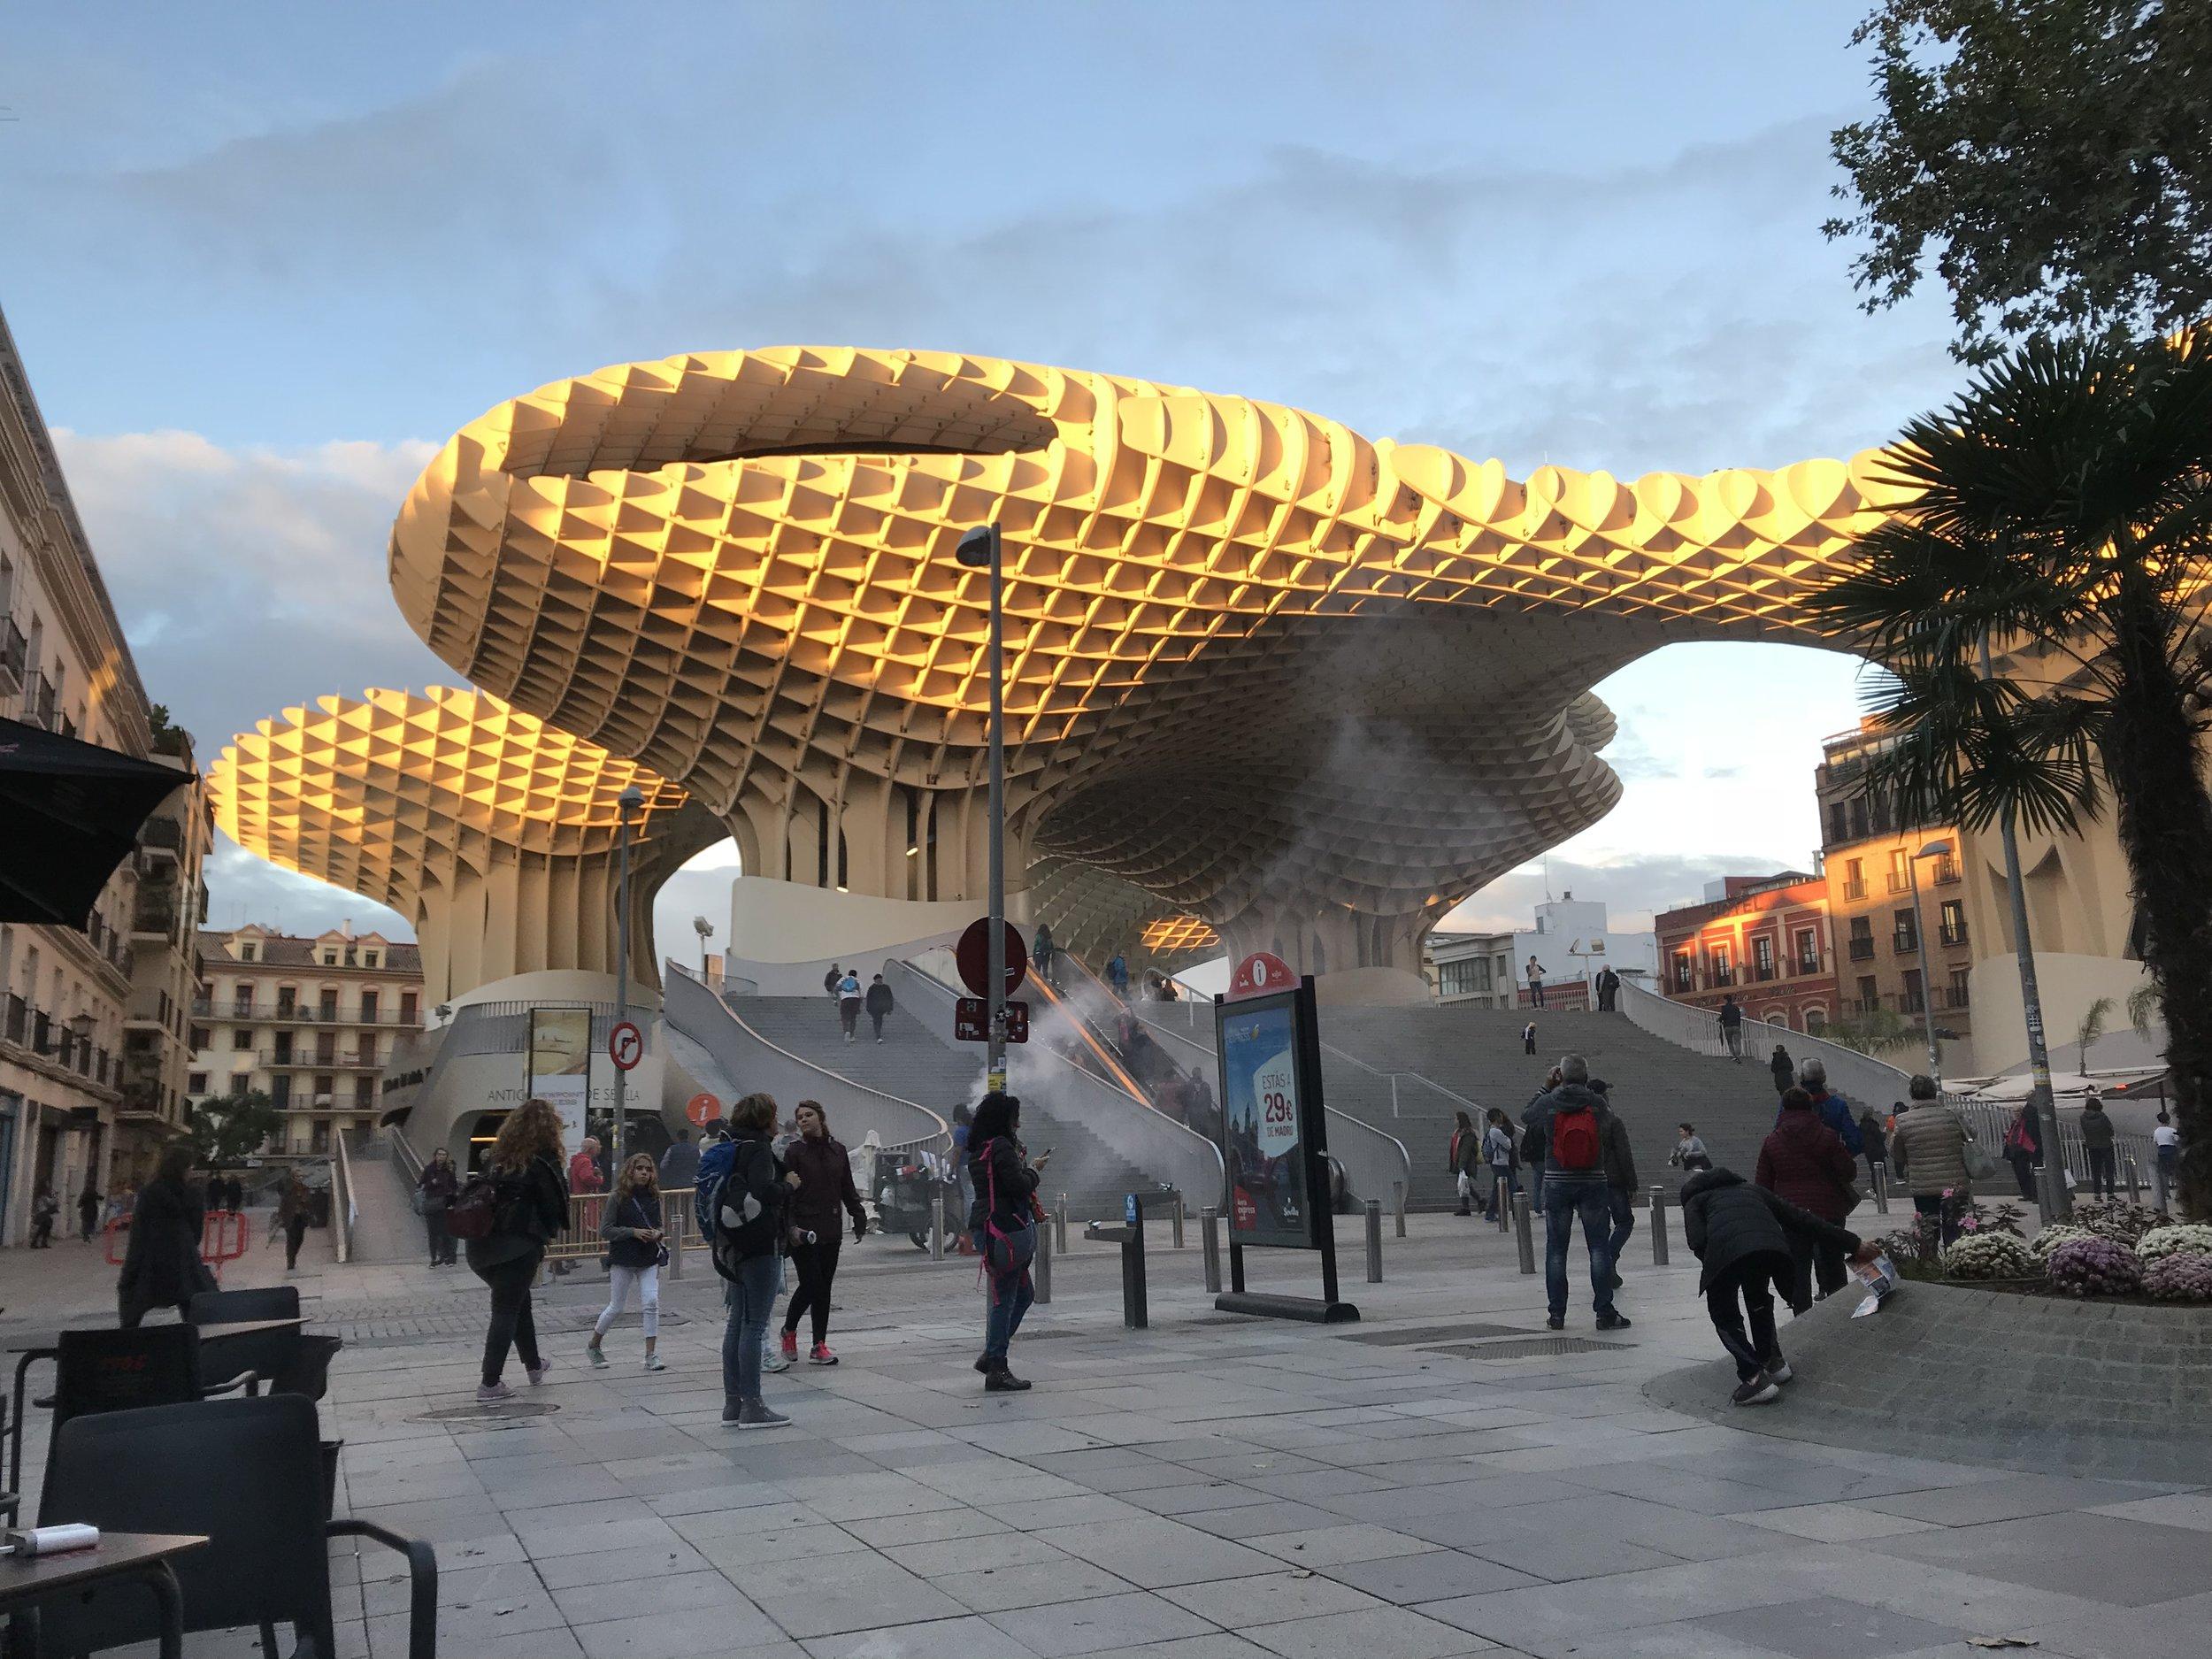 El Metropol Parasol de Sevilla